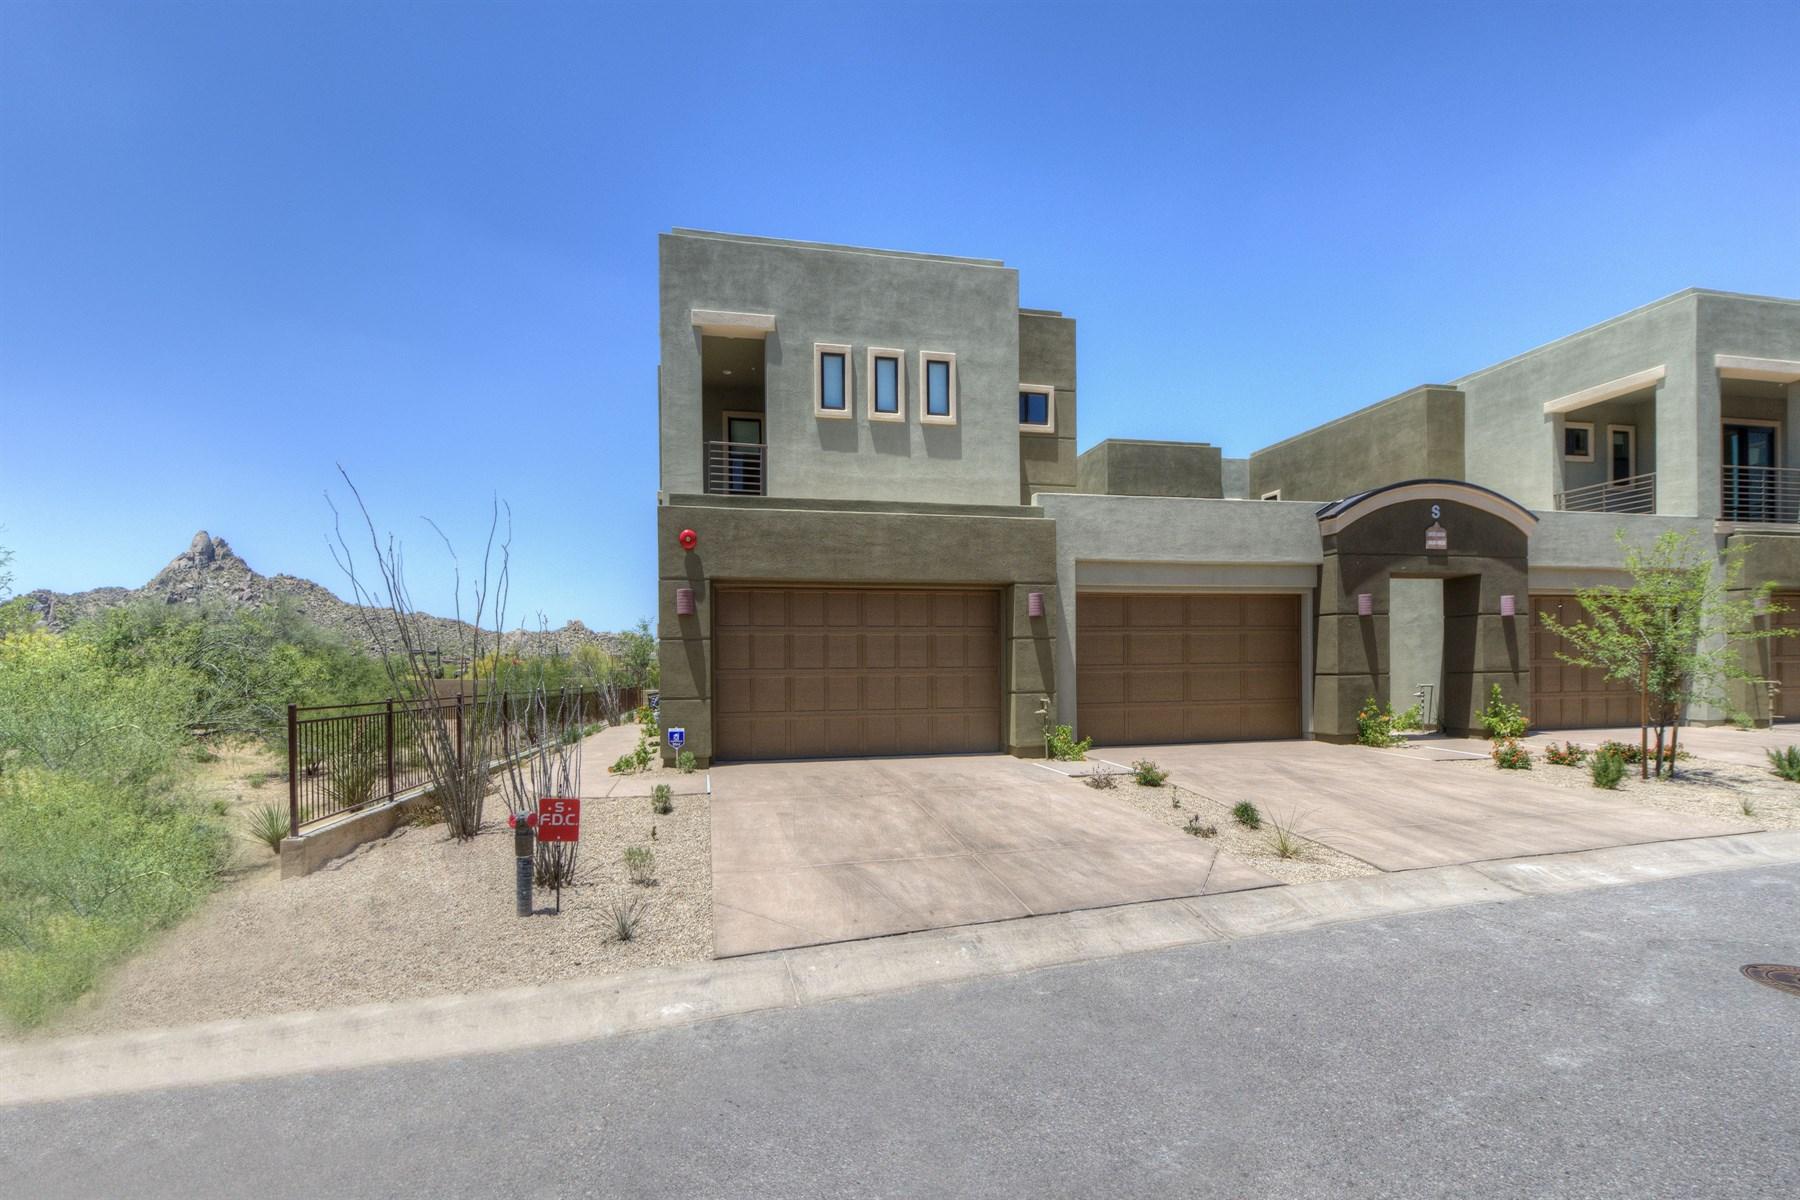 Căn hộ vì Bán tại New exclusive gated community 'pinnacle pointe 27000 N ALMA SCHOOL PKWY 1037 Scottsdale, Arizona 85262 Hoa Kỳ